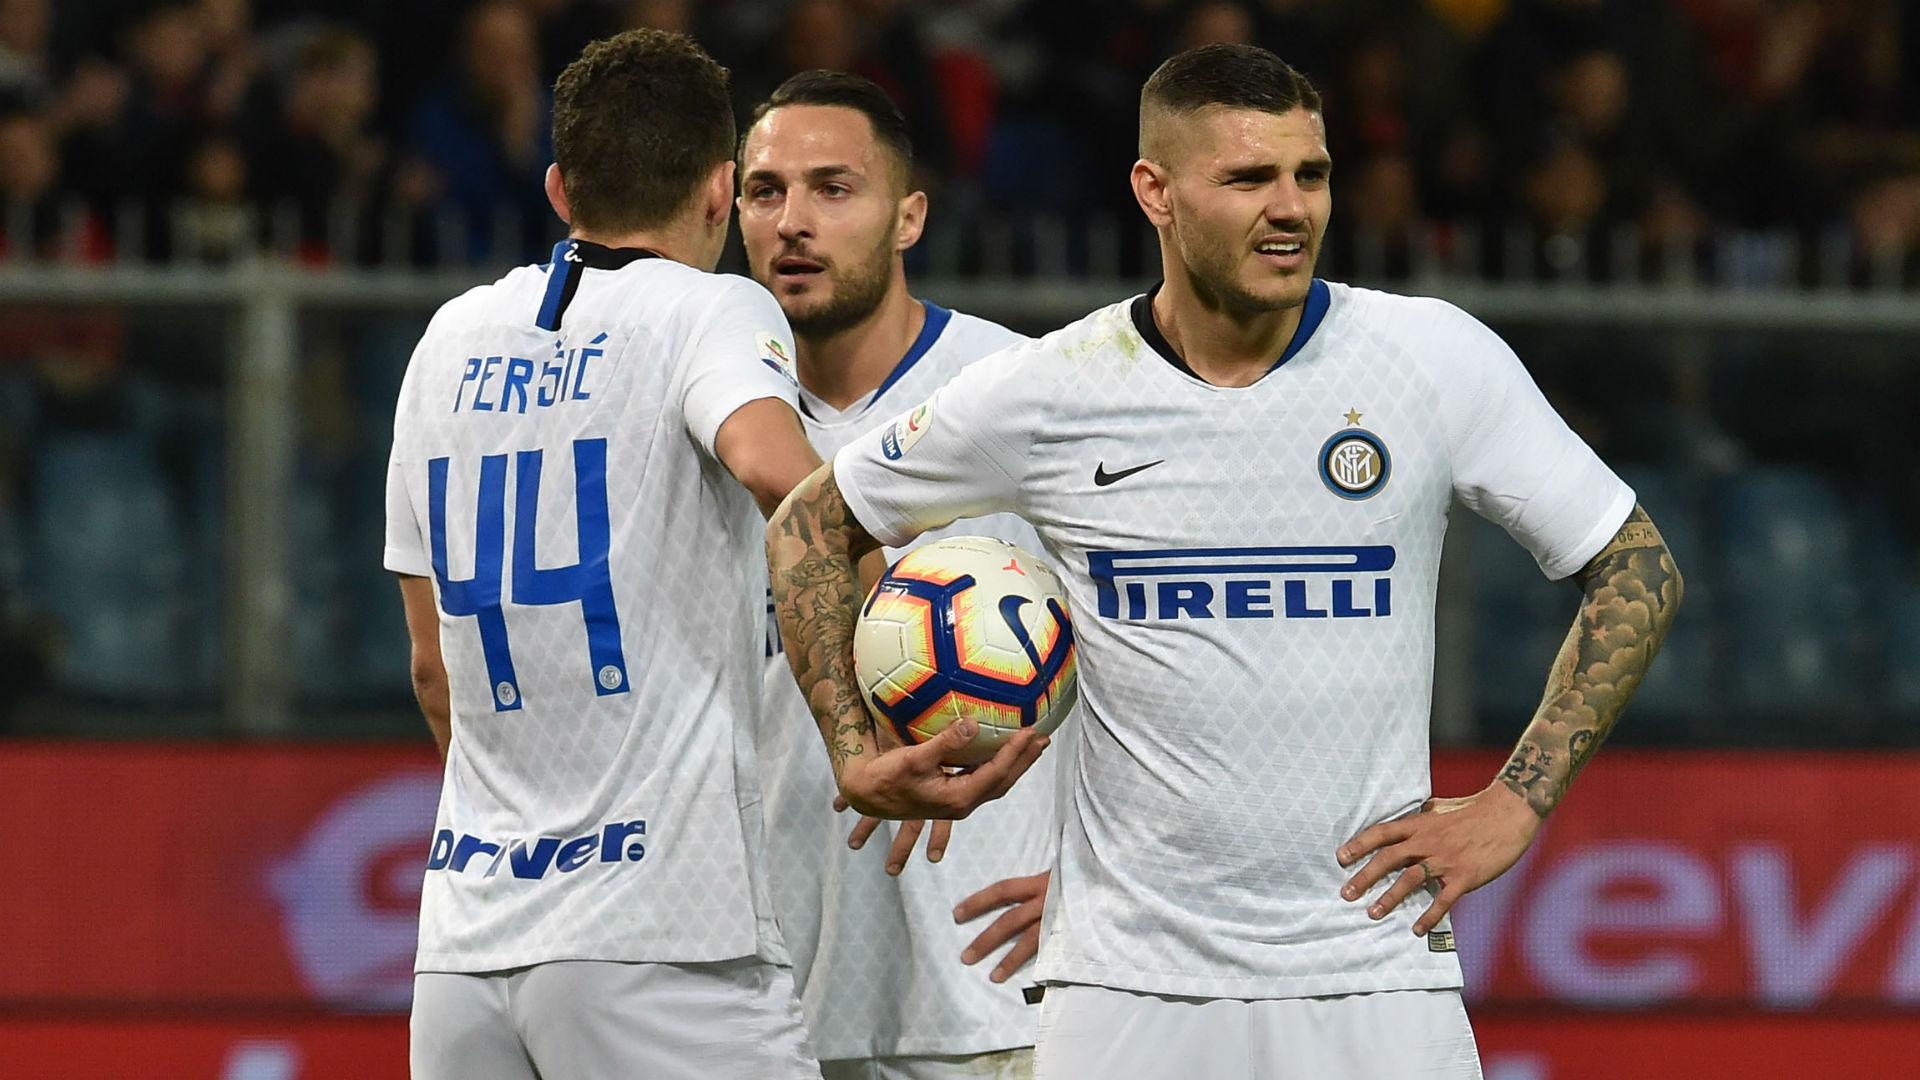 Icardi Perisic Genoa Inter